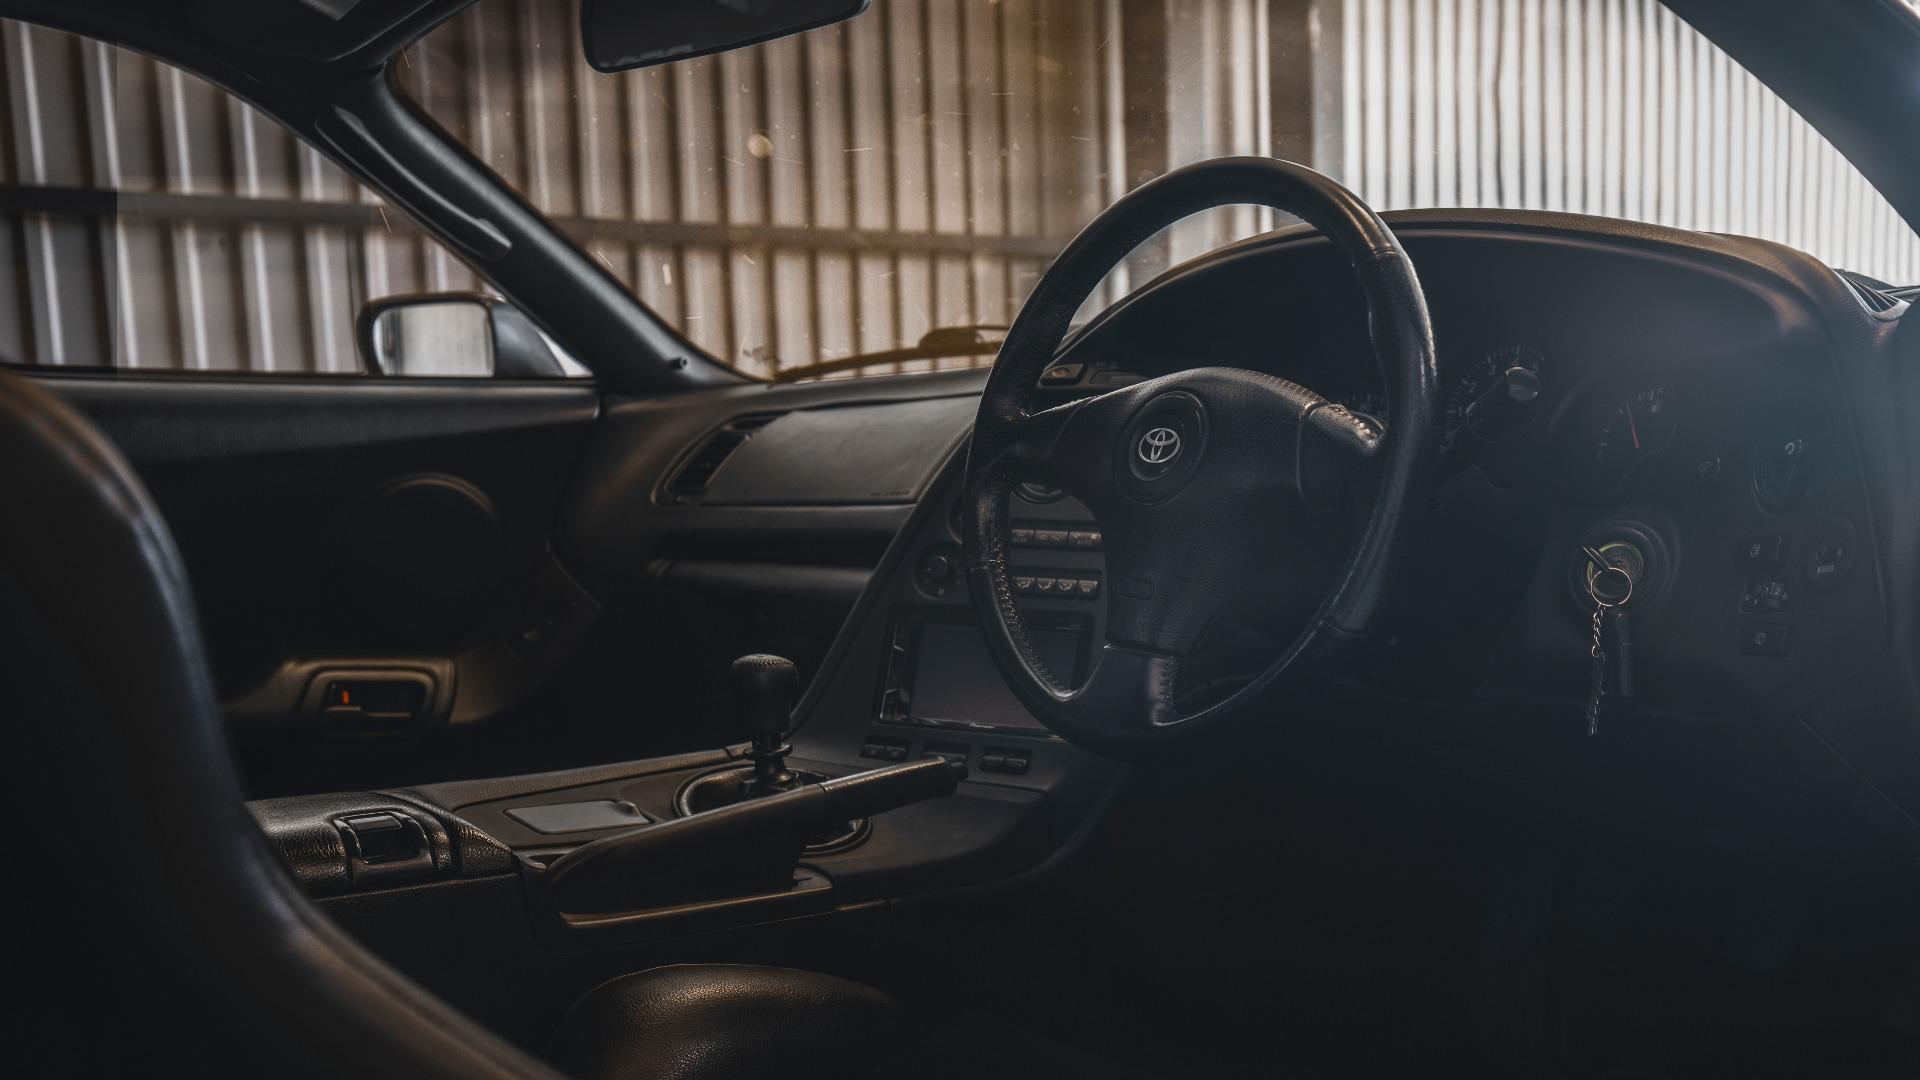 Drømmen om Toyota Supra - 1994 Toyota Supra